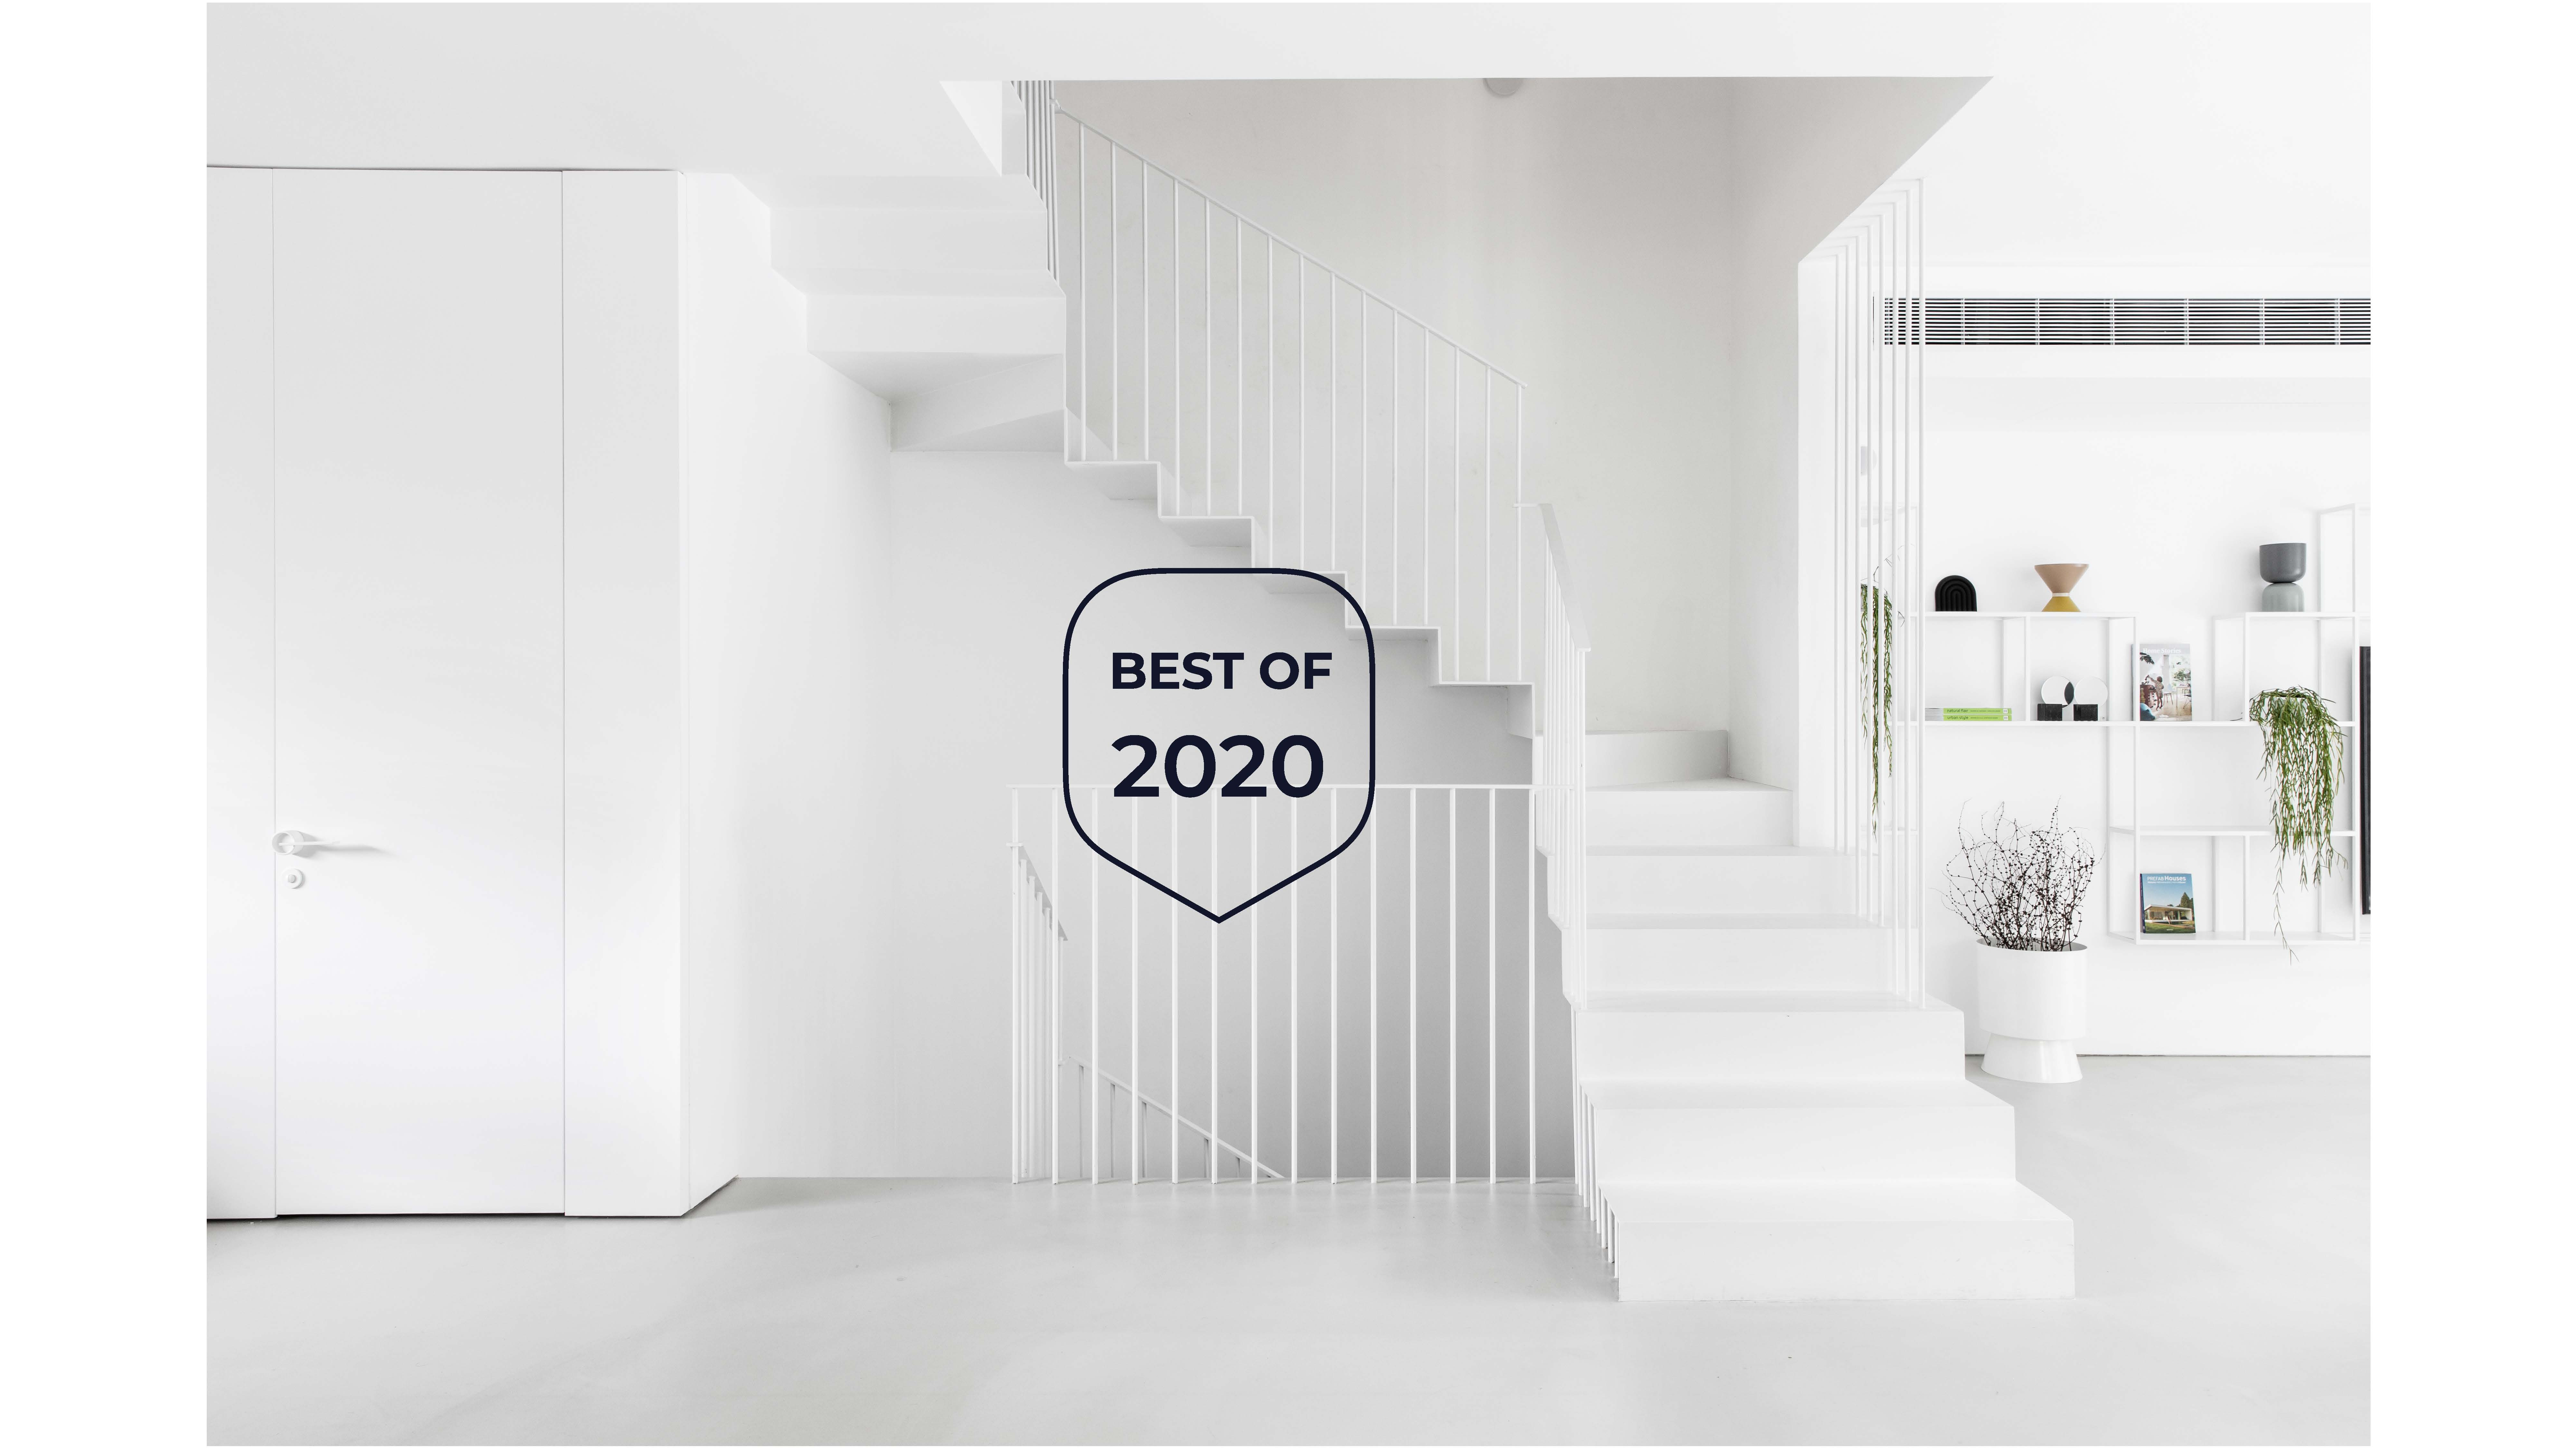 archello_best-of-2020